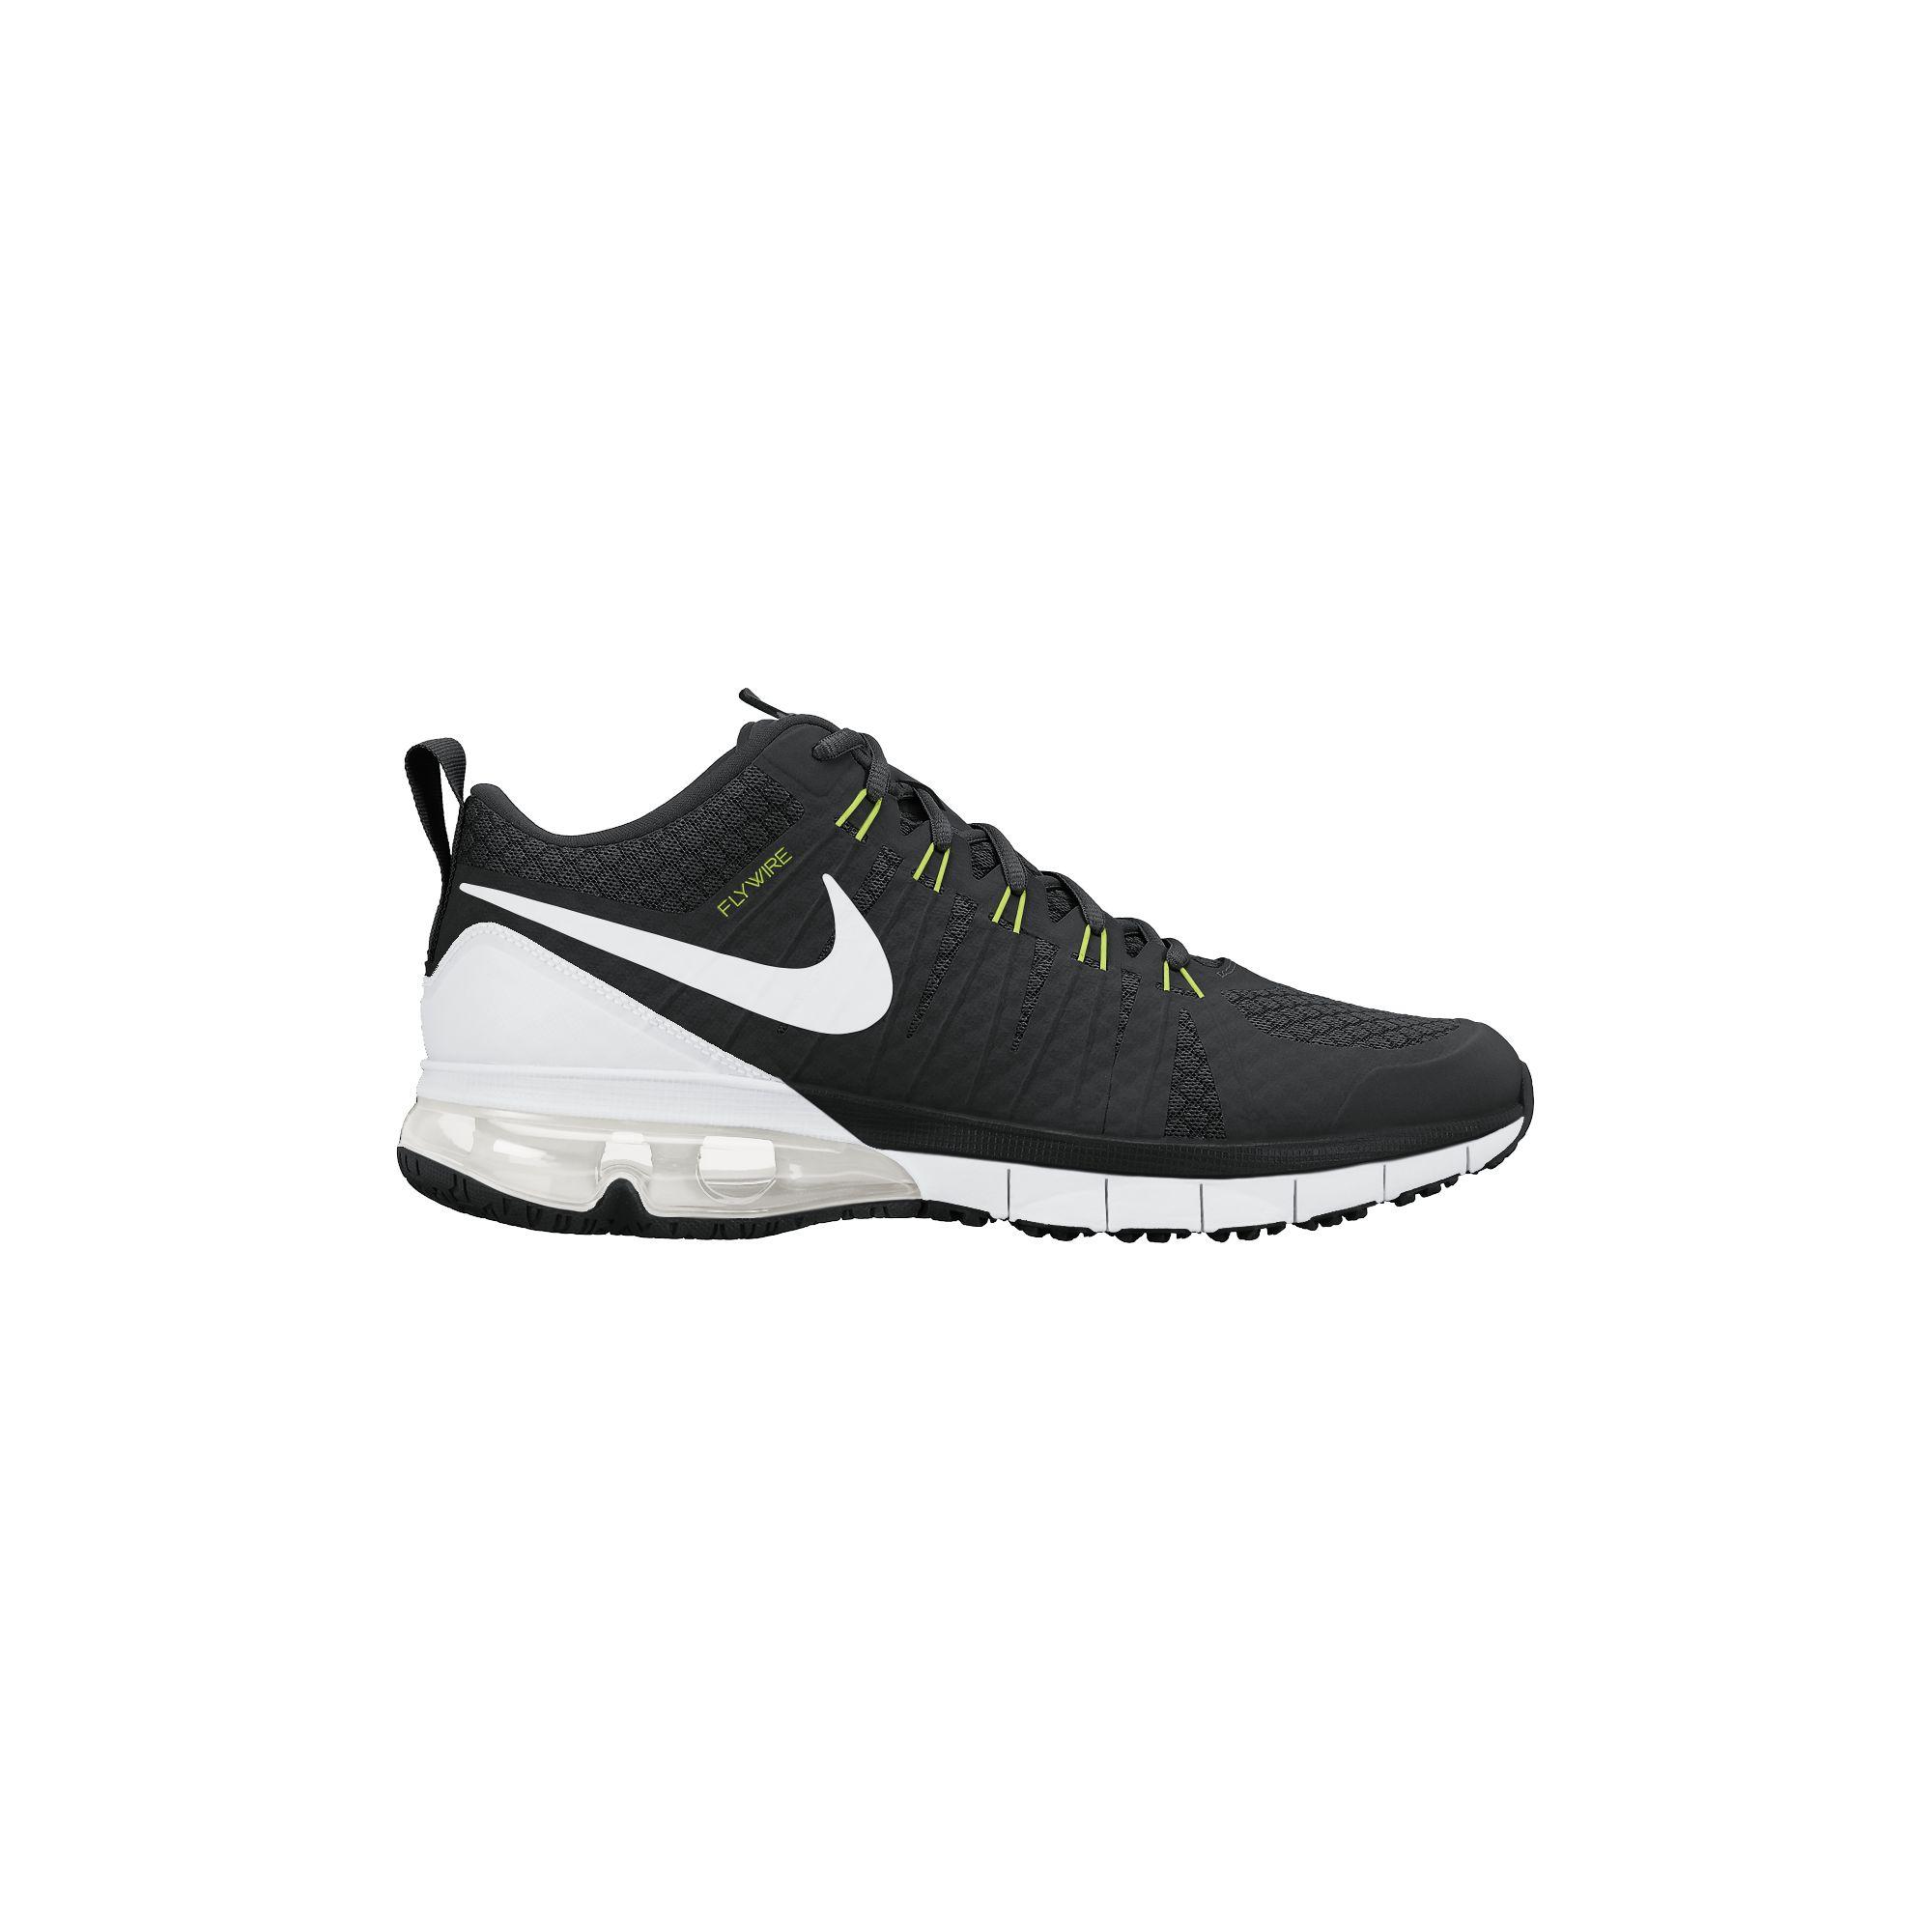 Men's Nike Air Max TR180 Training Shoe Sieverts Sporting Goods